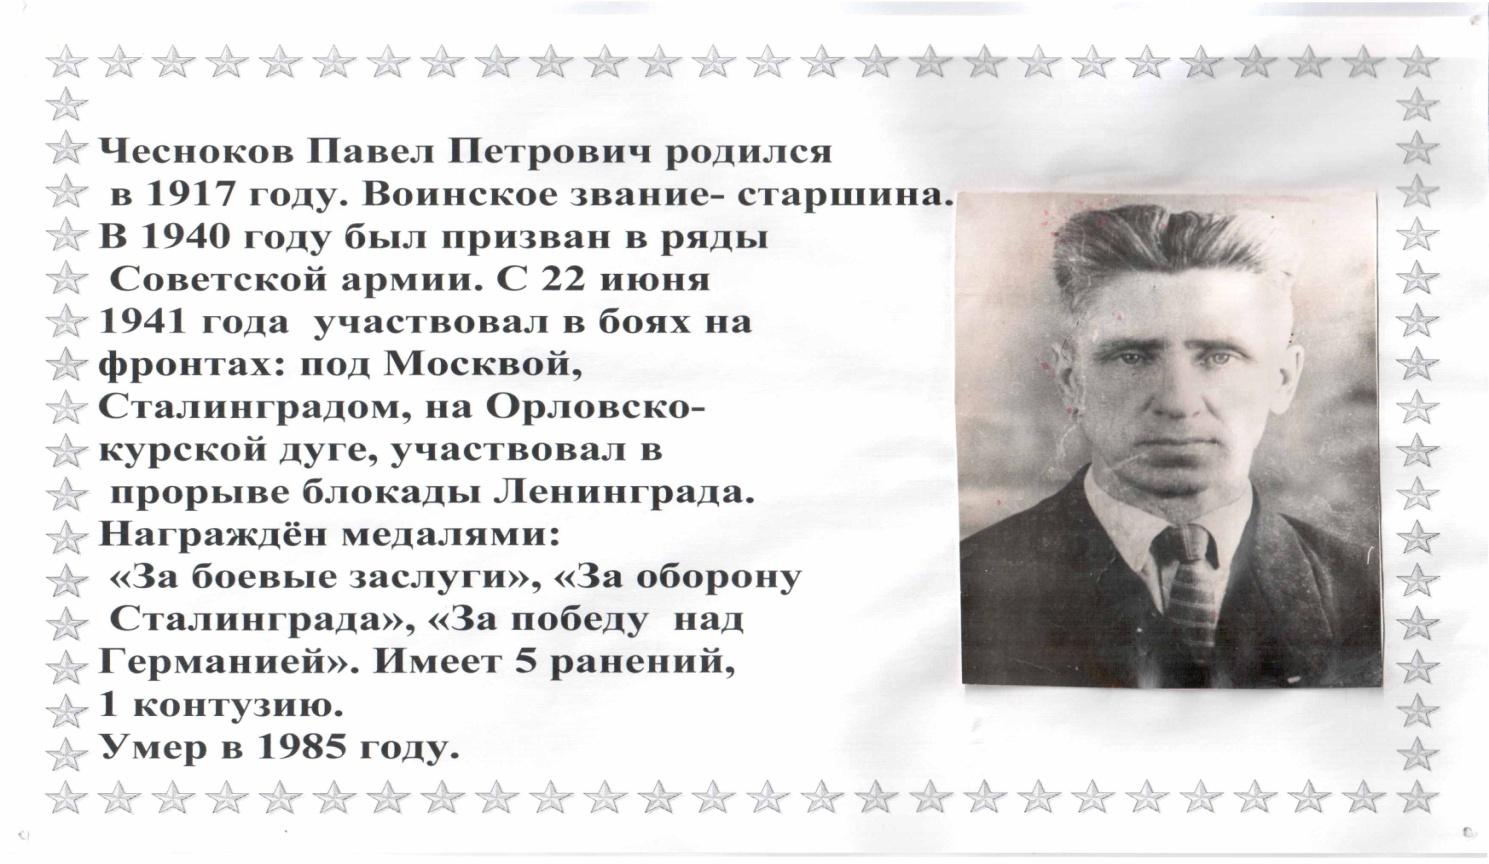 G:\Участники сталинграда\Чесноков.jpg